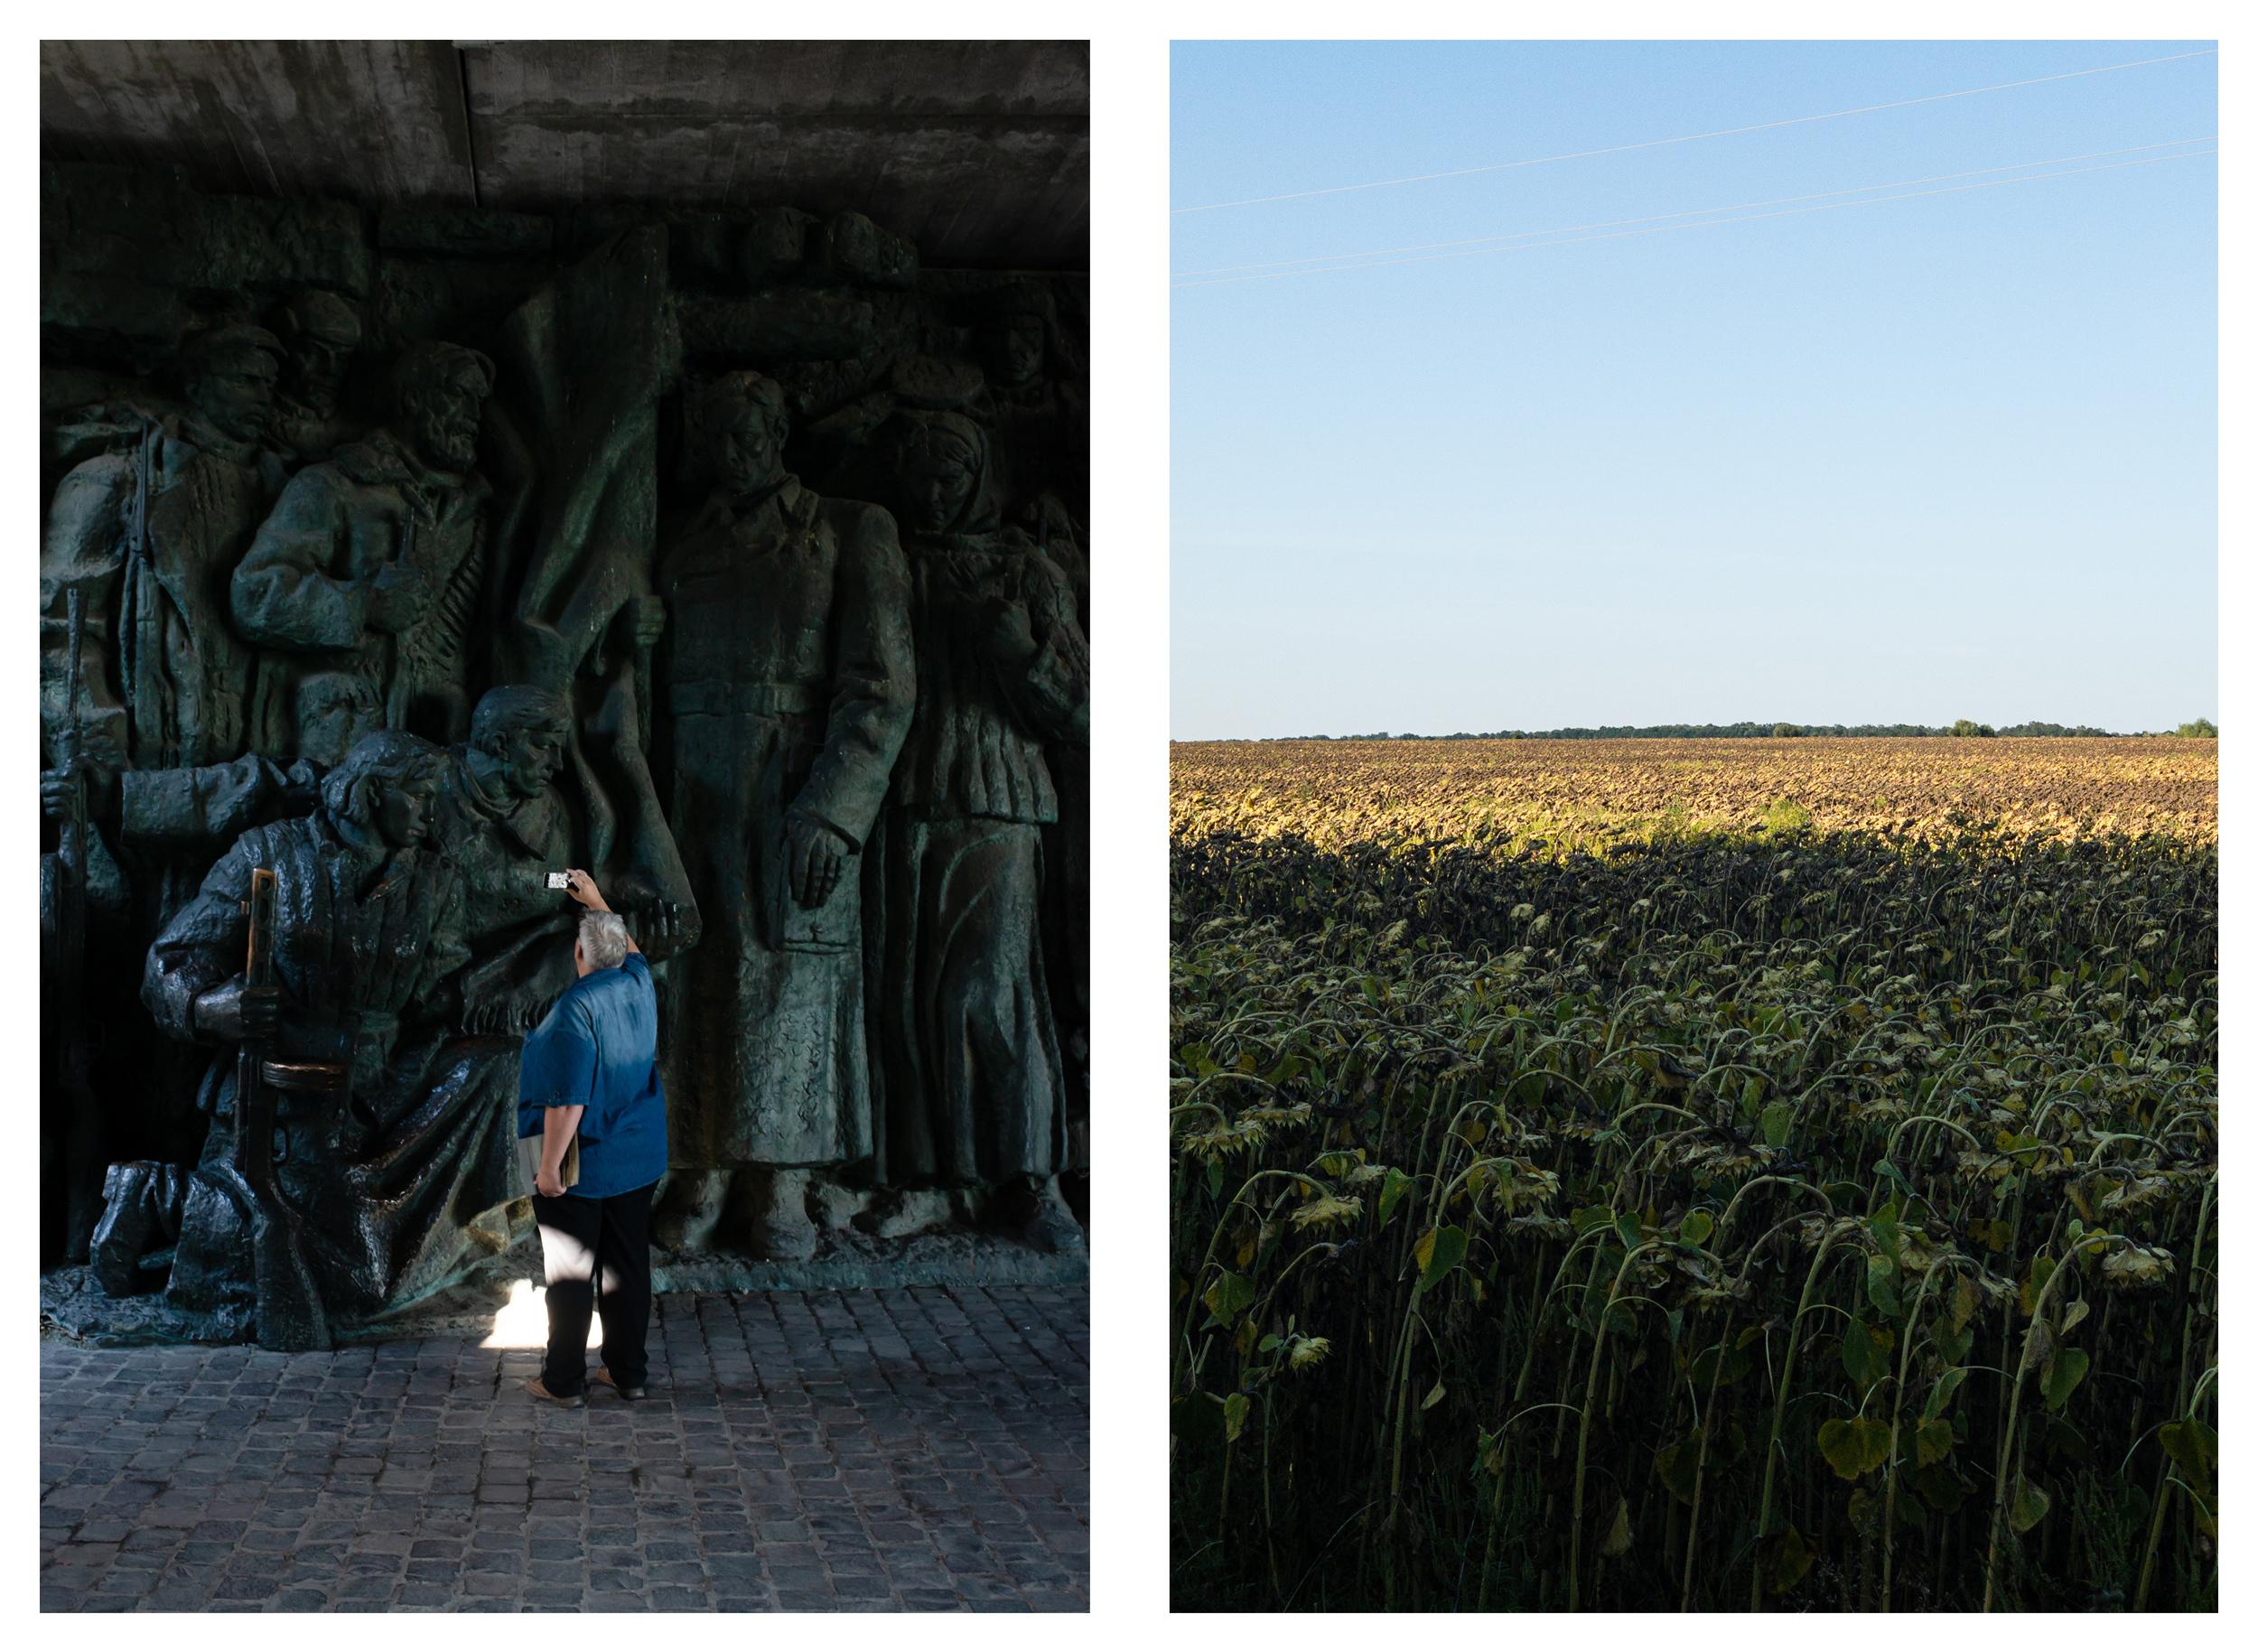 20190910_Kiev_diptik02.jpg